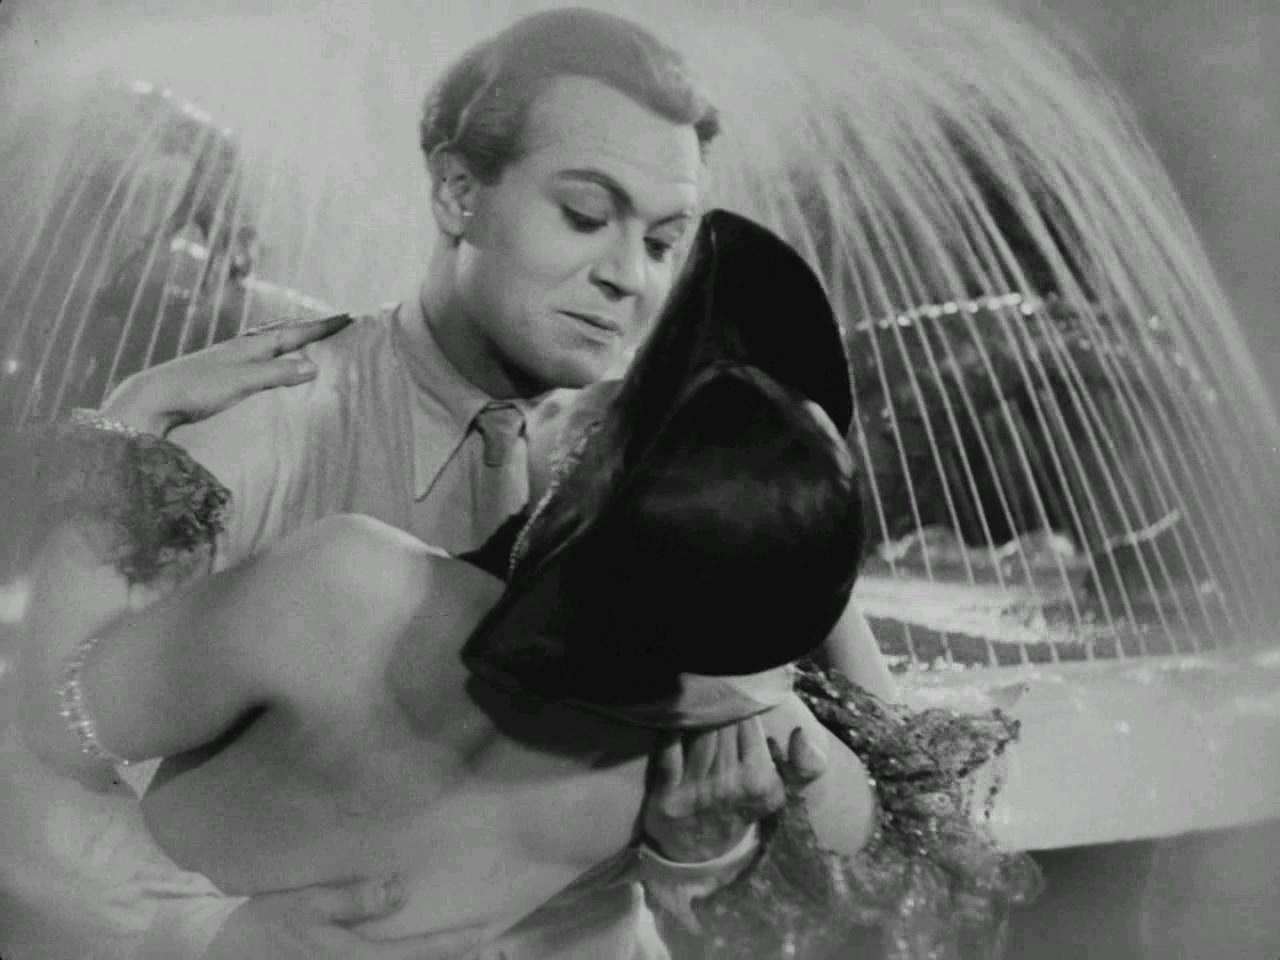 Metropolis (1927) (2010 restored edition)